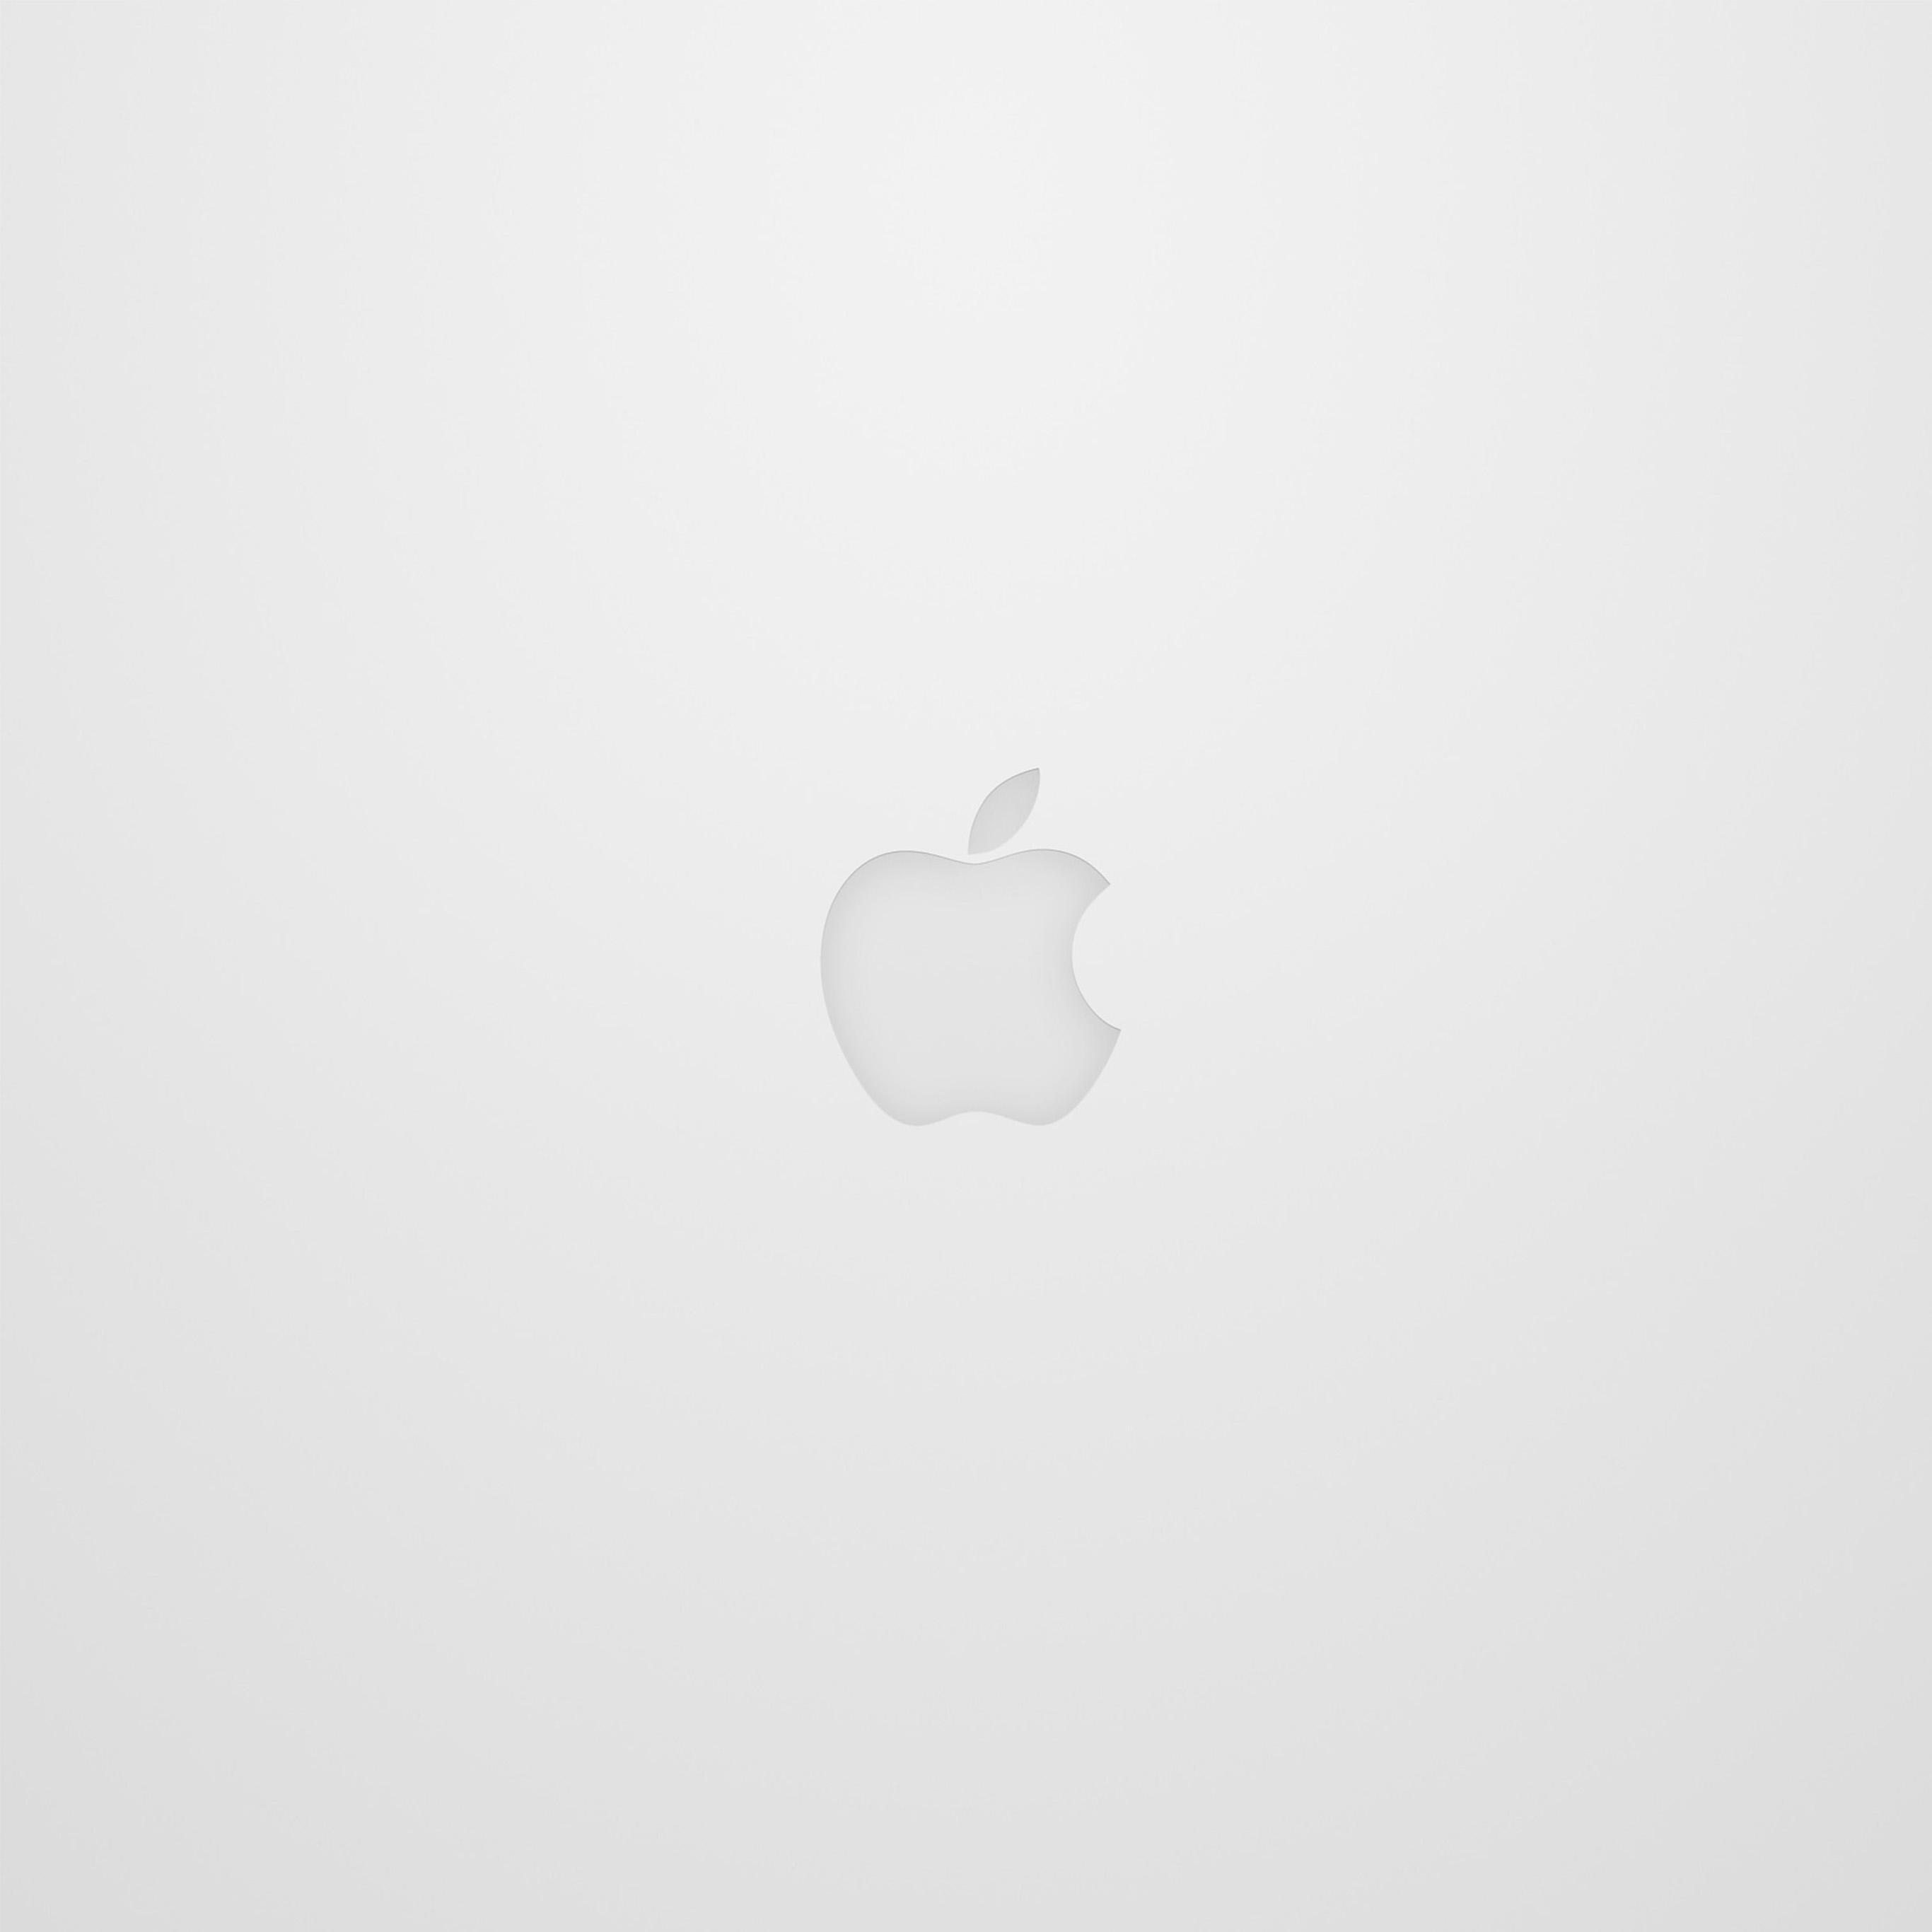 rrr 2732x2732 0011 freeios7com apple wallpaper the apple ipad retina 2732x2732